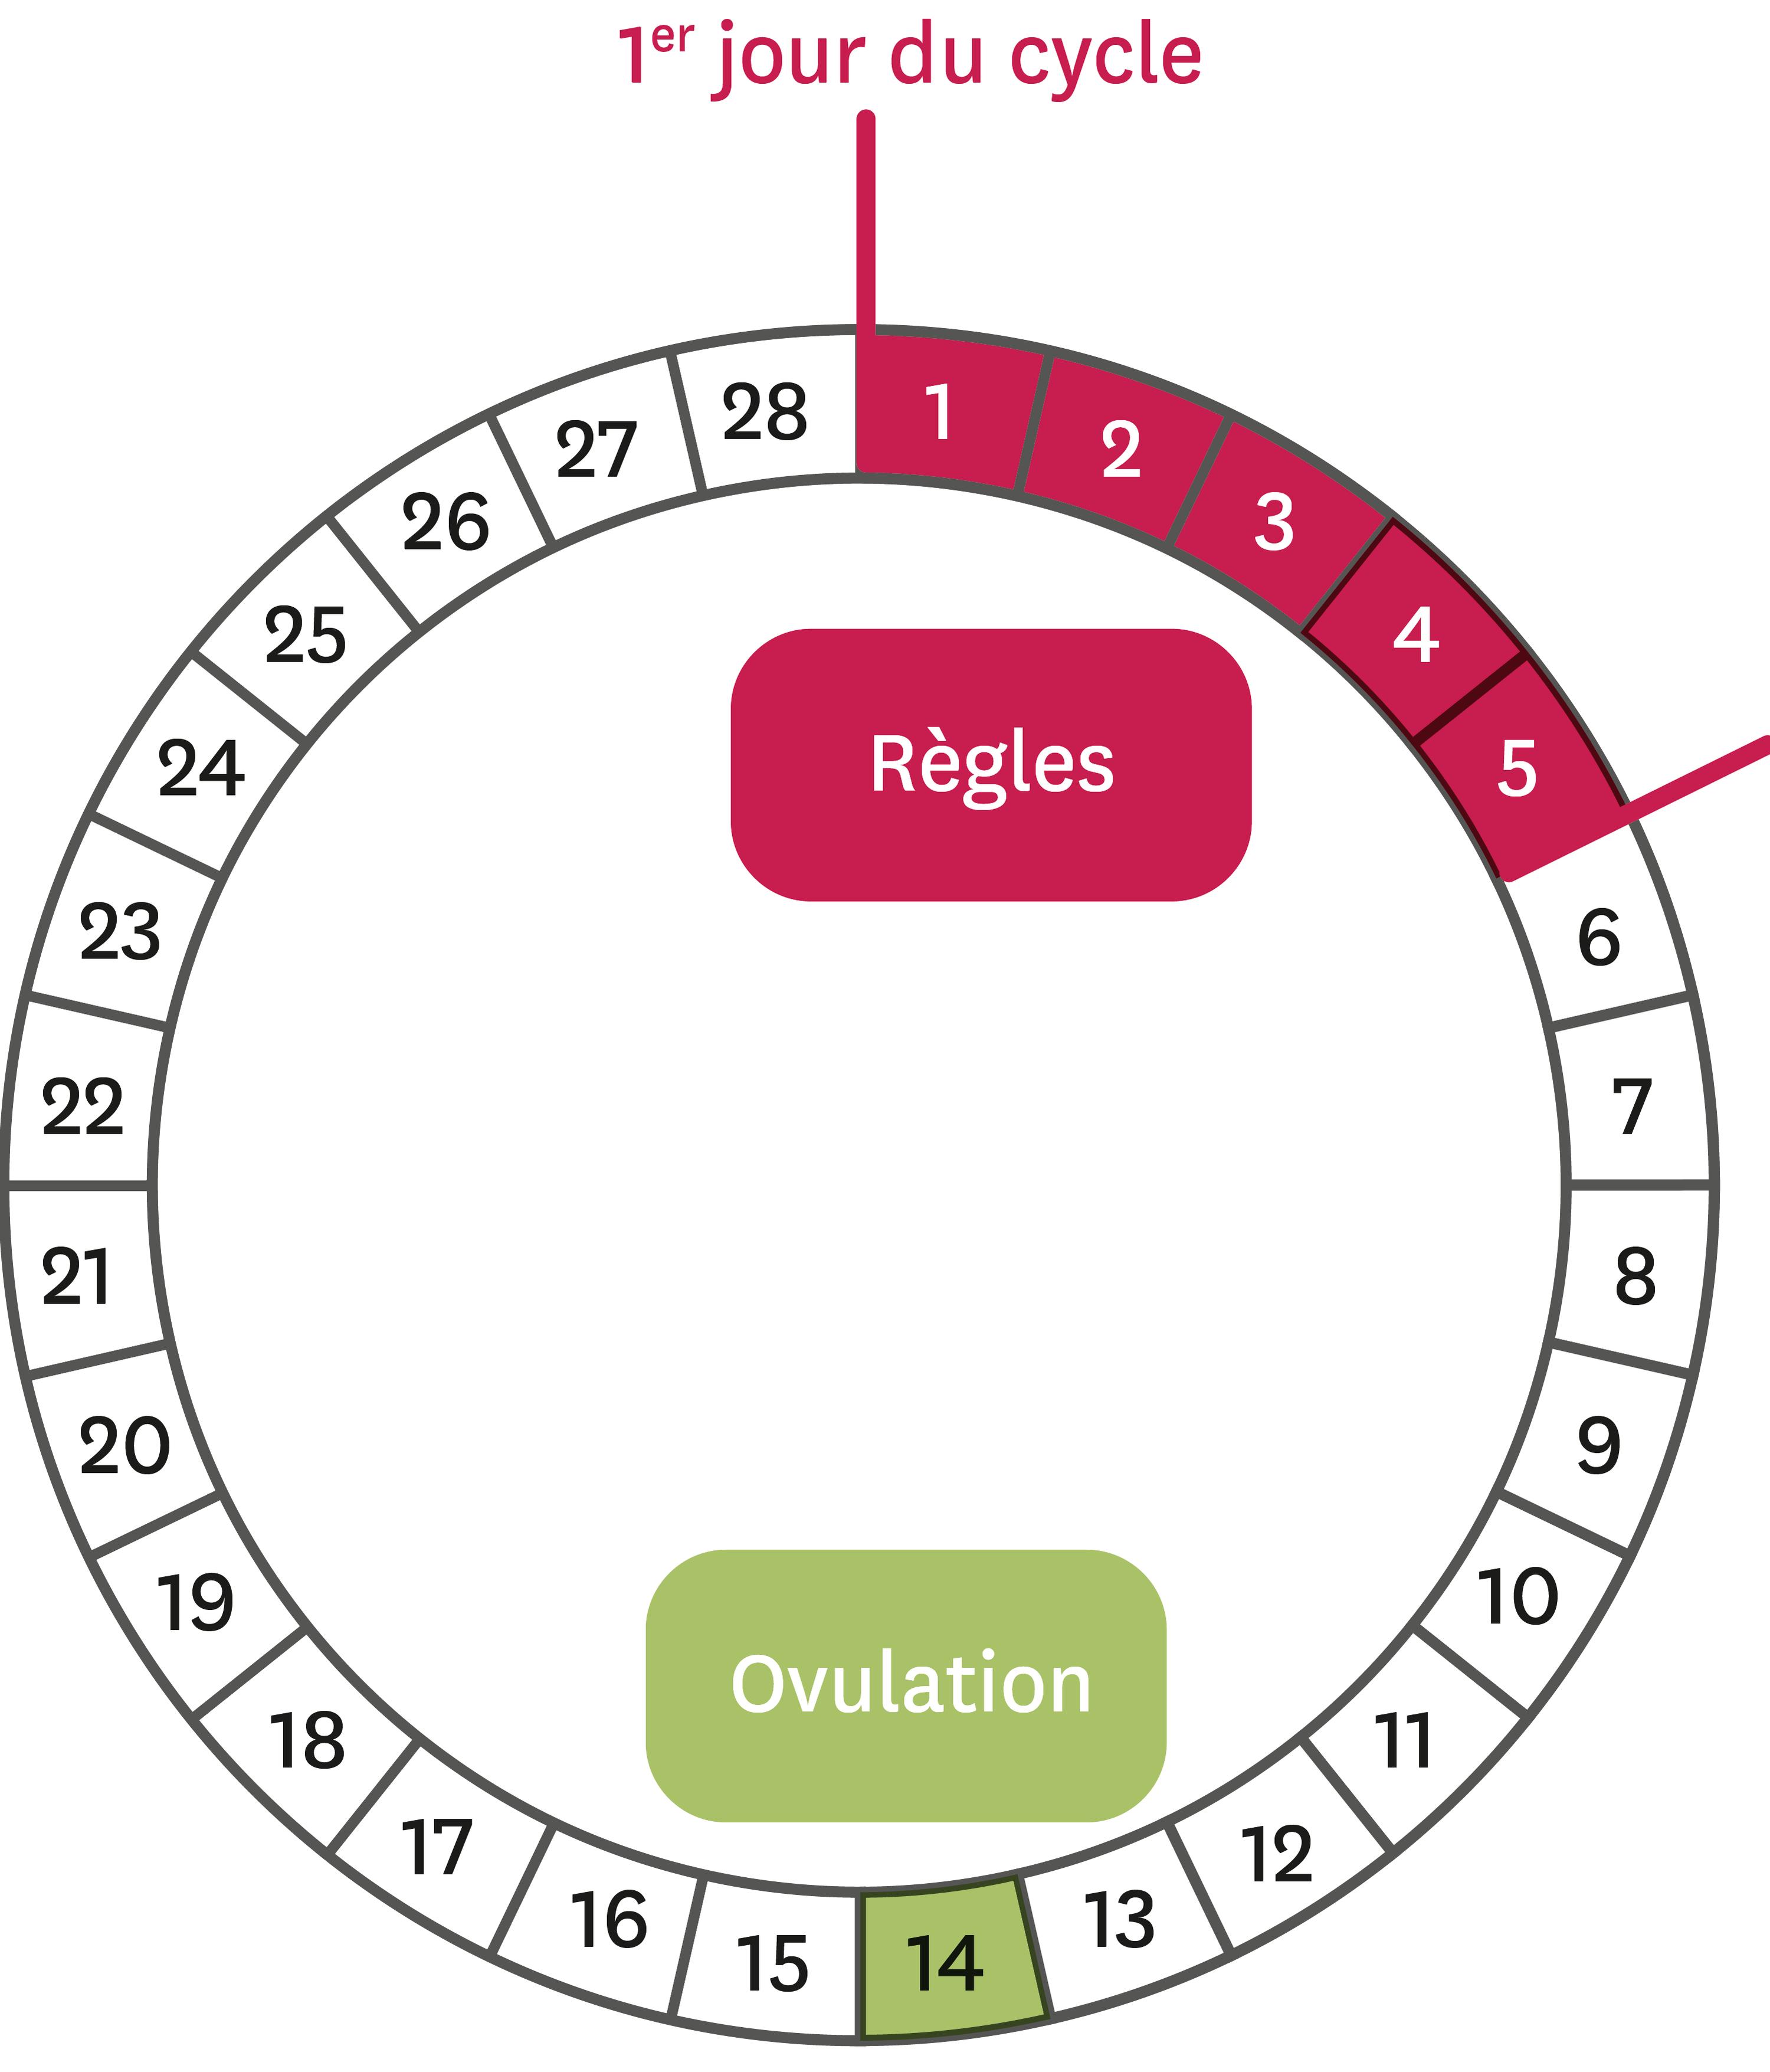 <stamp theme='svt-green1'>Doc. 2</stamp> Le cycle féminin théorique.